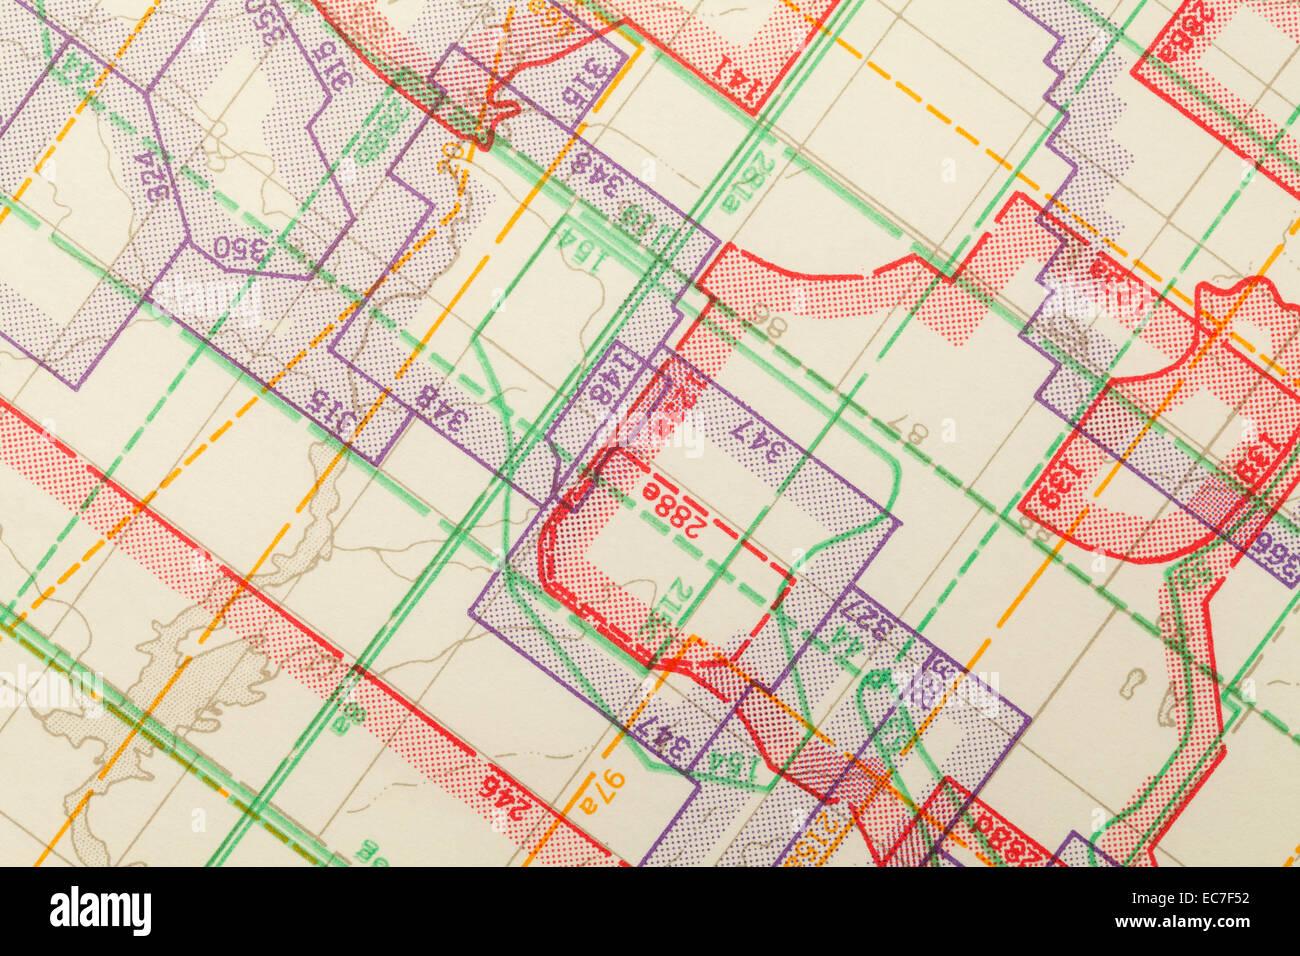 Geometric Multi Colored Zoned Topographical Map Segment. - Stock Image